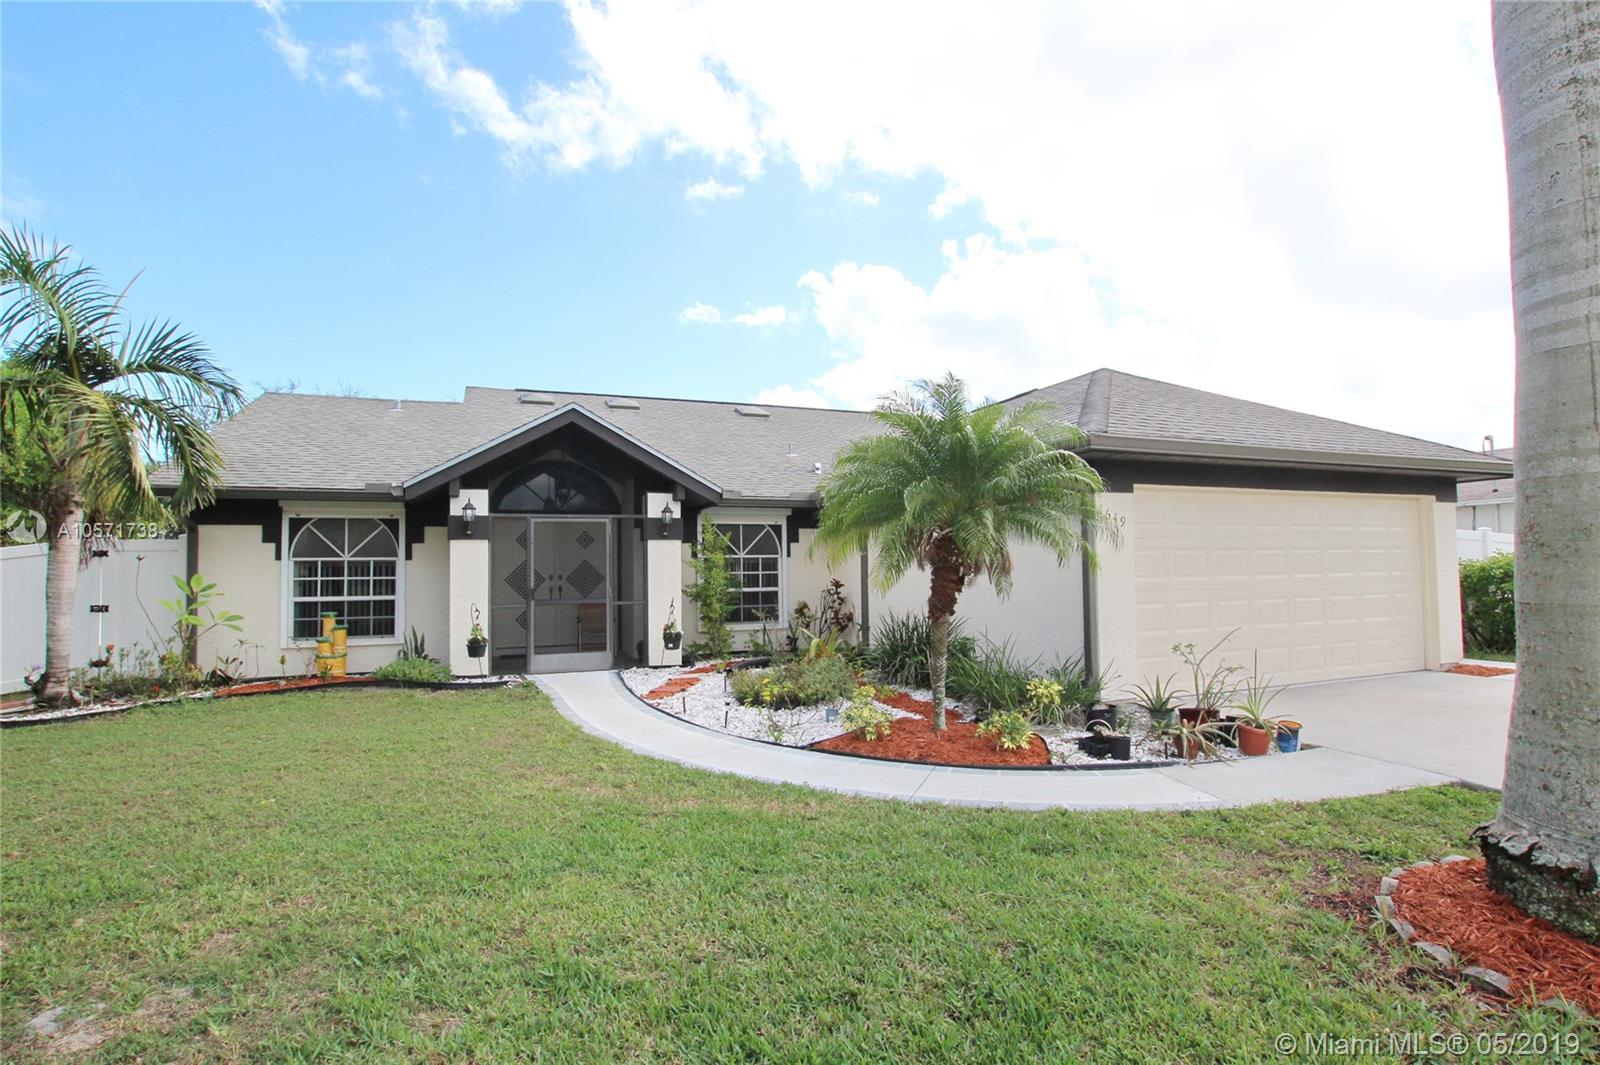 1649 SE Ridgewood St, Port St. Lucie, FL 34952